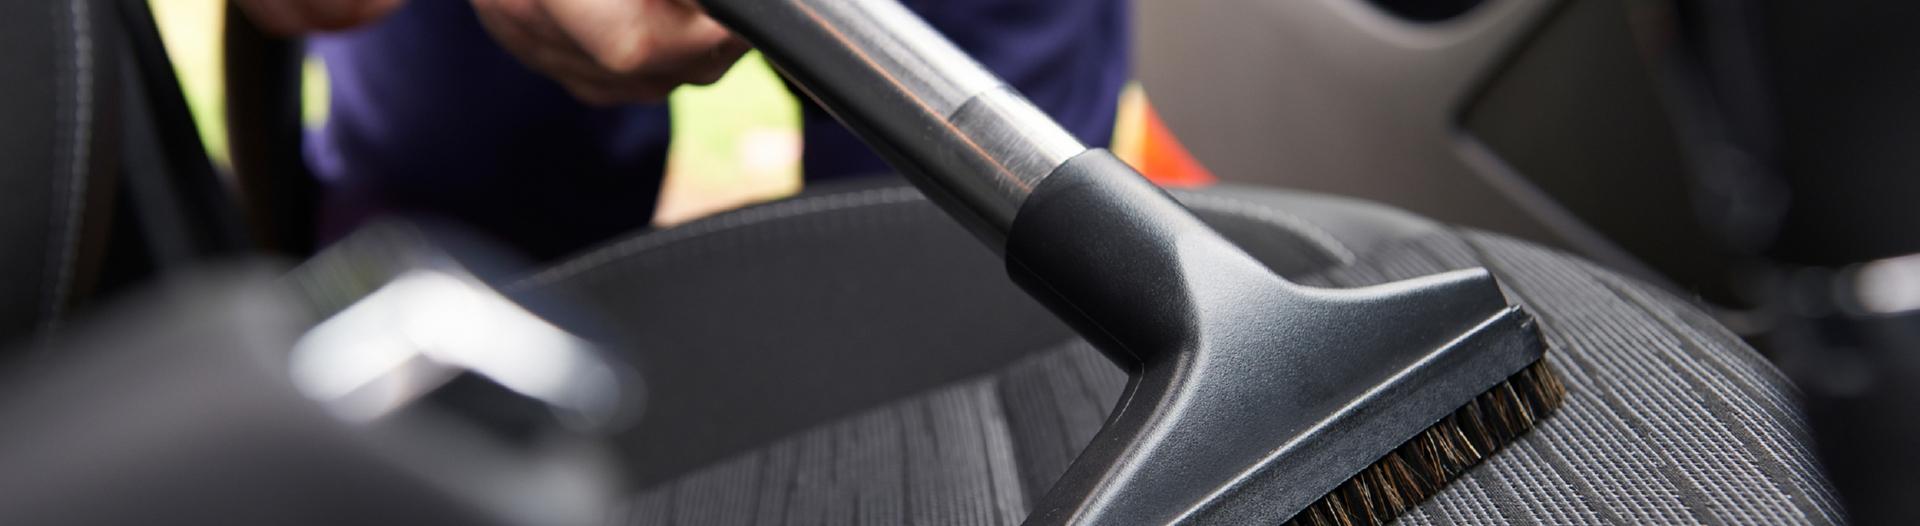 GOLD ПАКЕТ – Интезивна нега на возилото